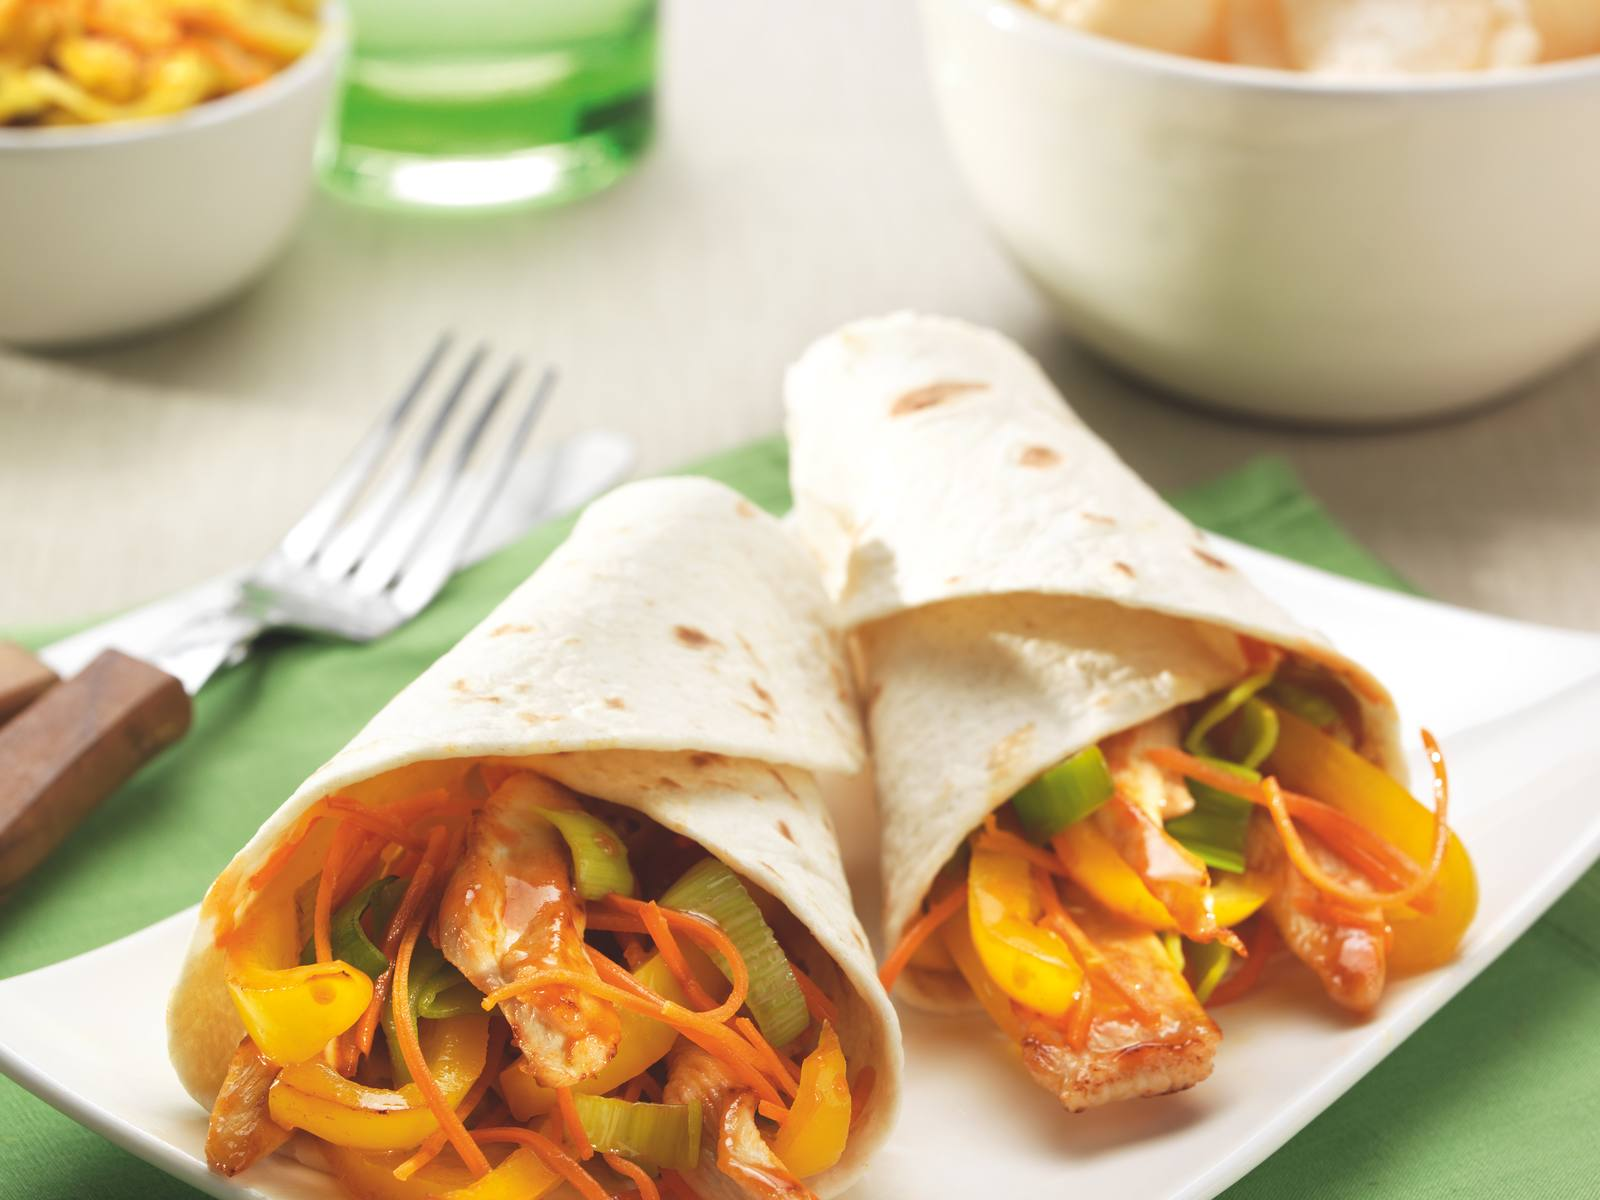 Sweet & Sour wrap met kip, wortel en paprika